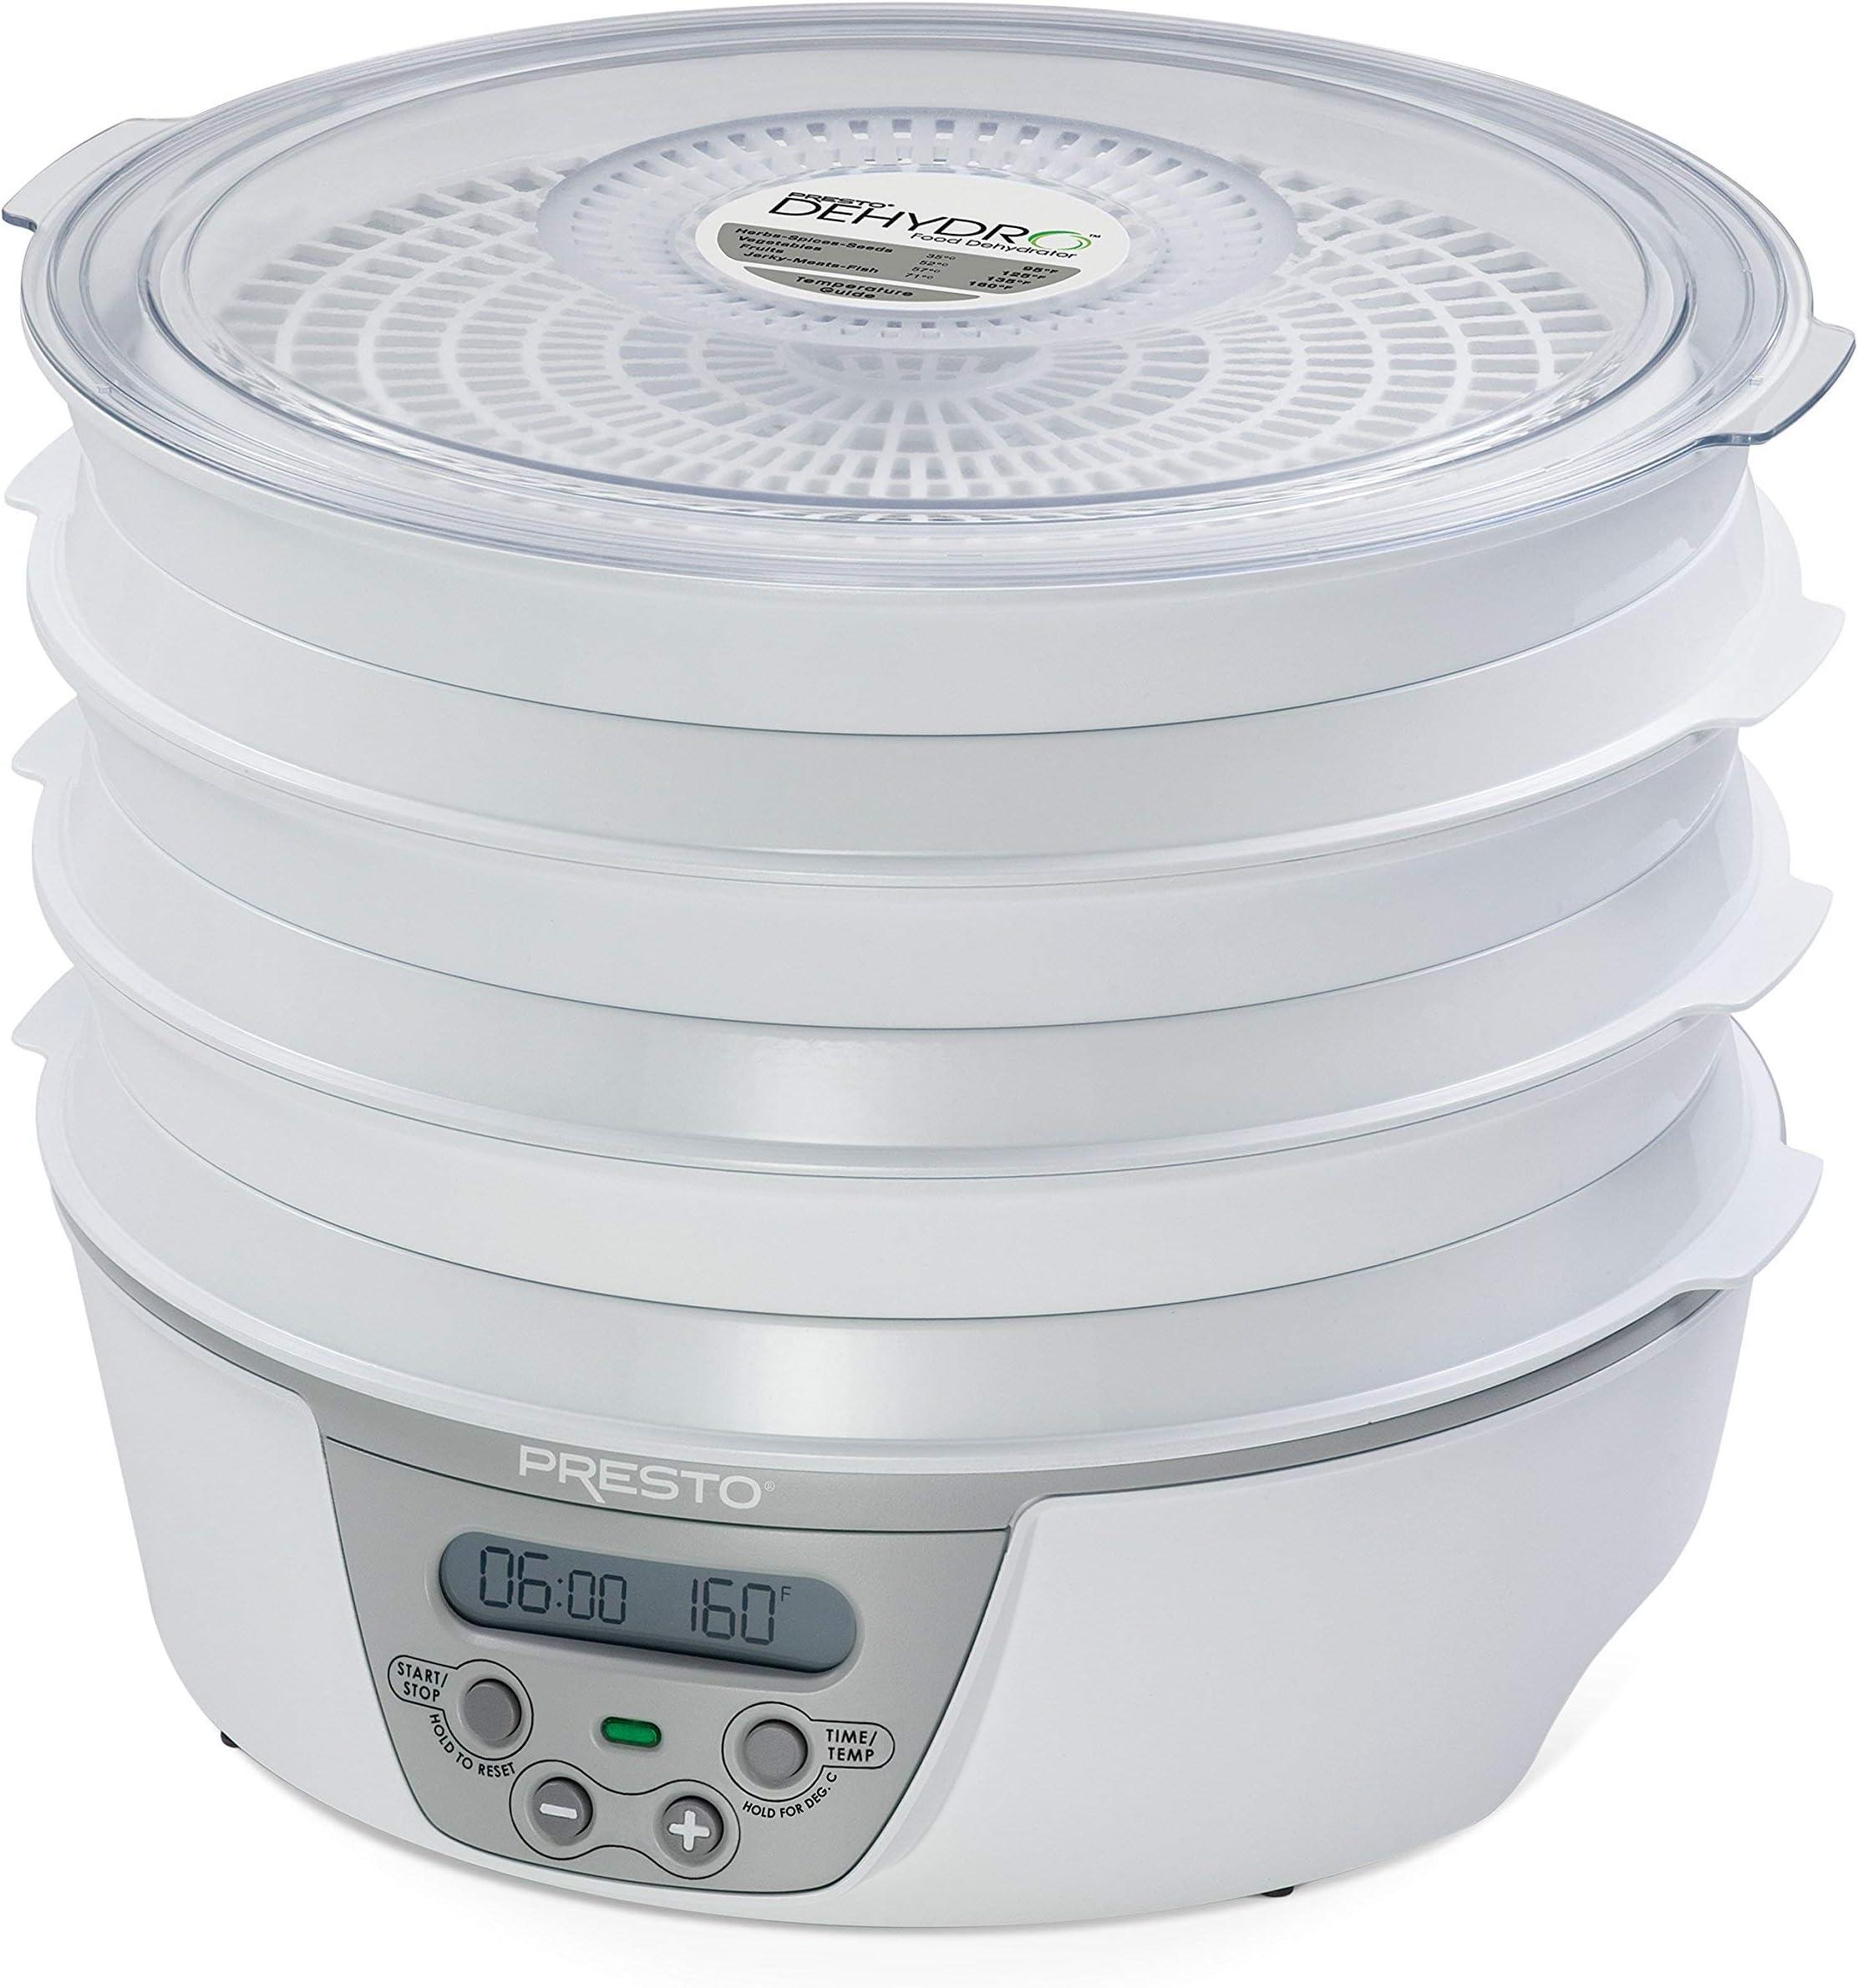 Presto 06301 Dehydro Digital Electric Food Dehydrator (Renewed)